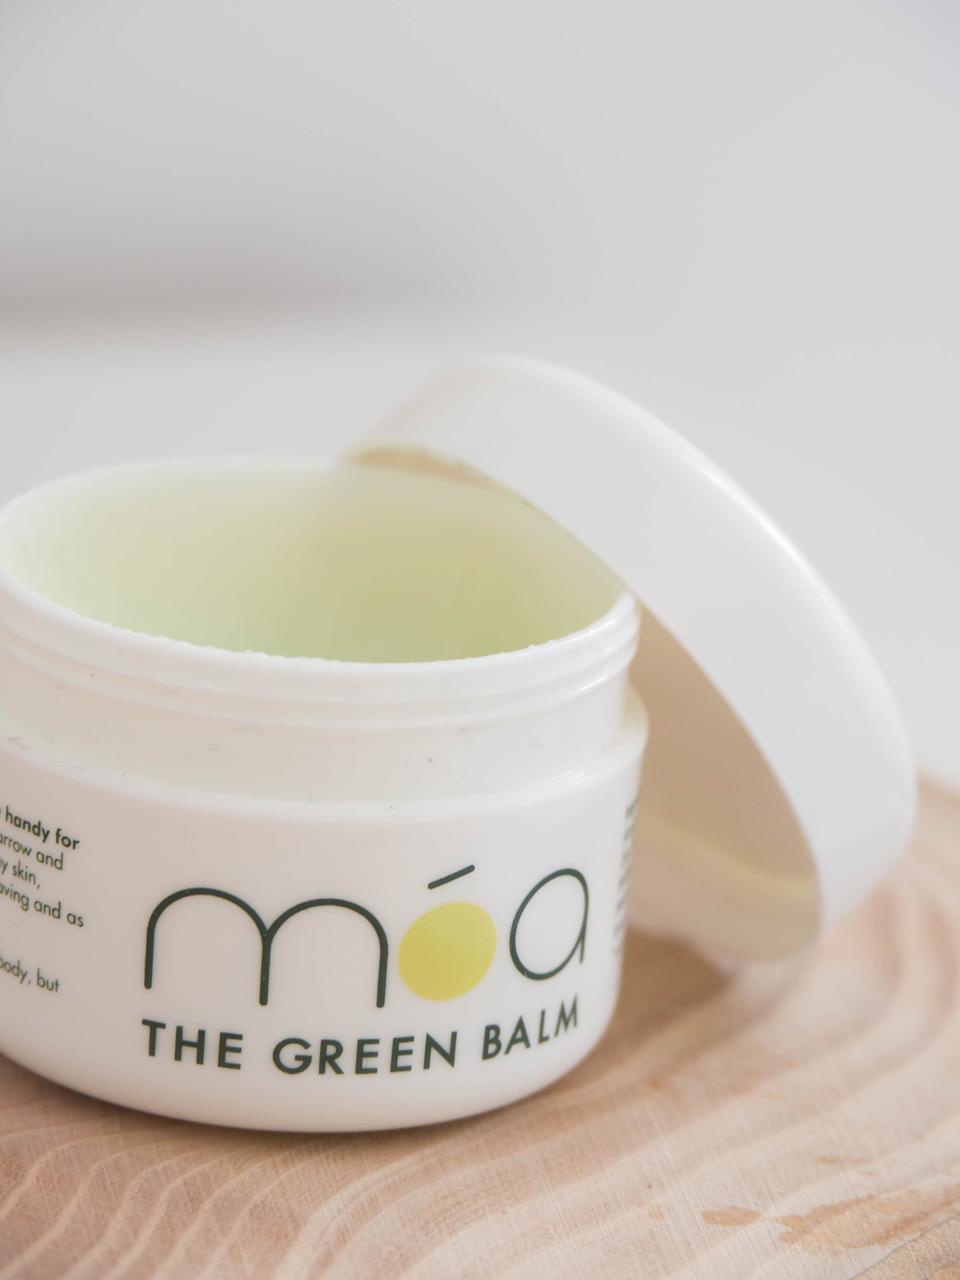 Beauté: Moa Green Balm